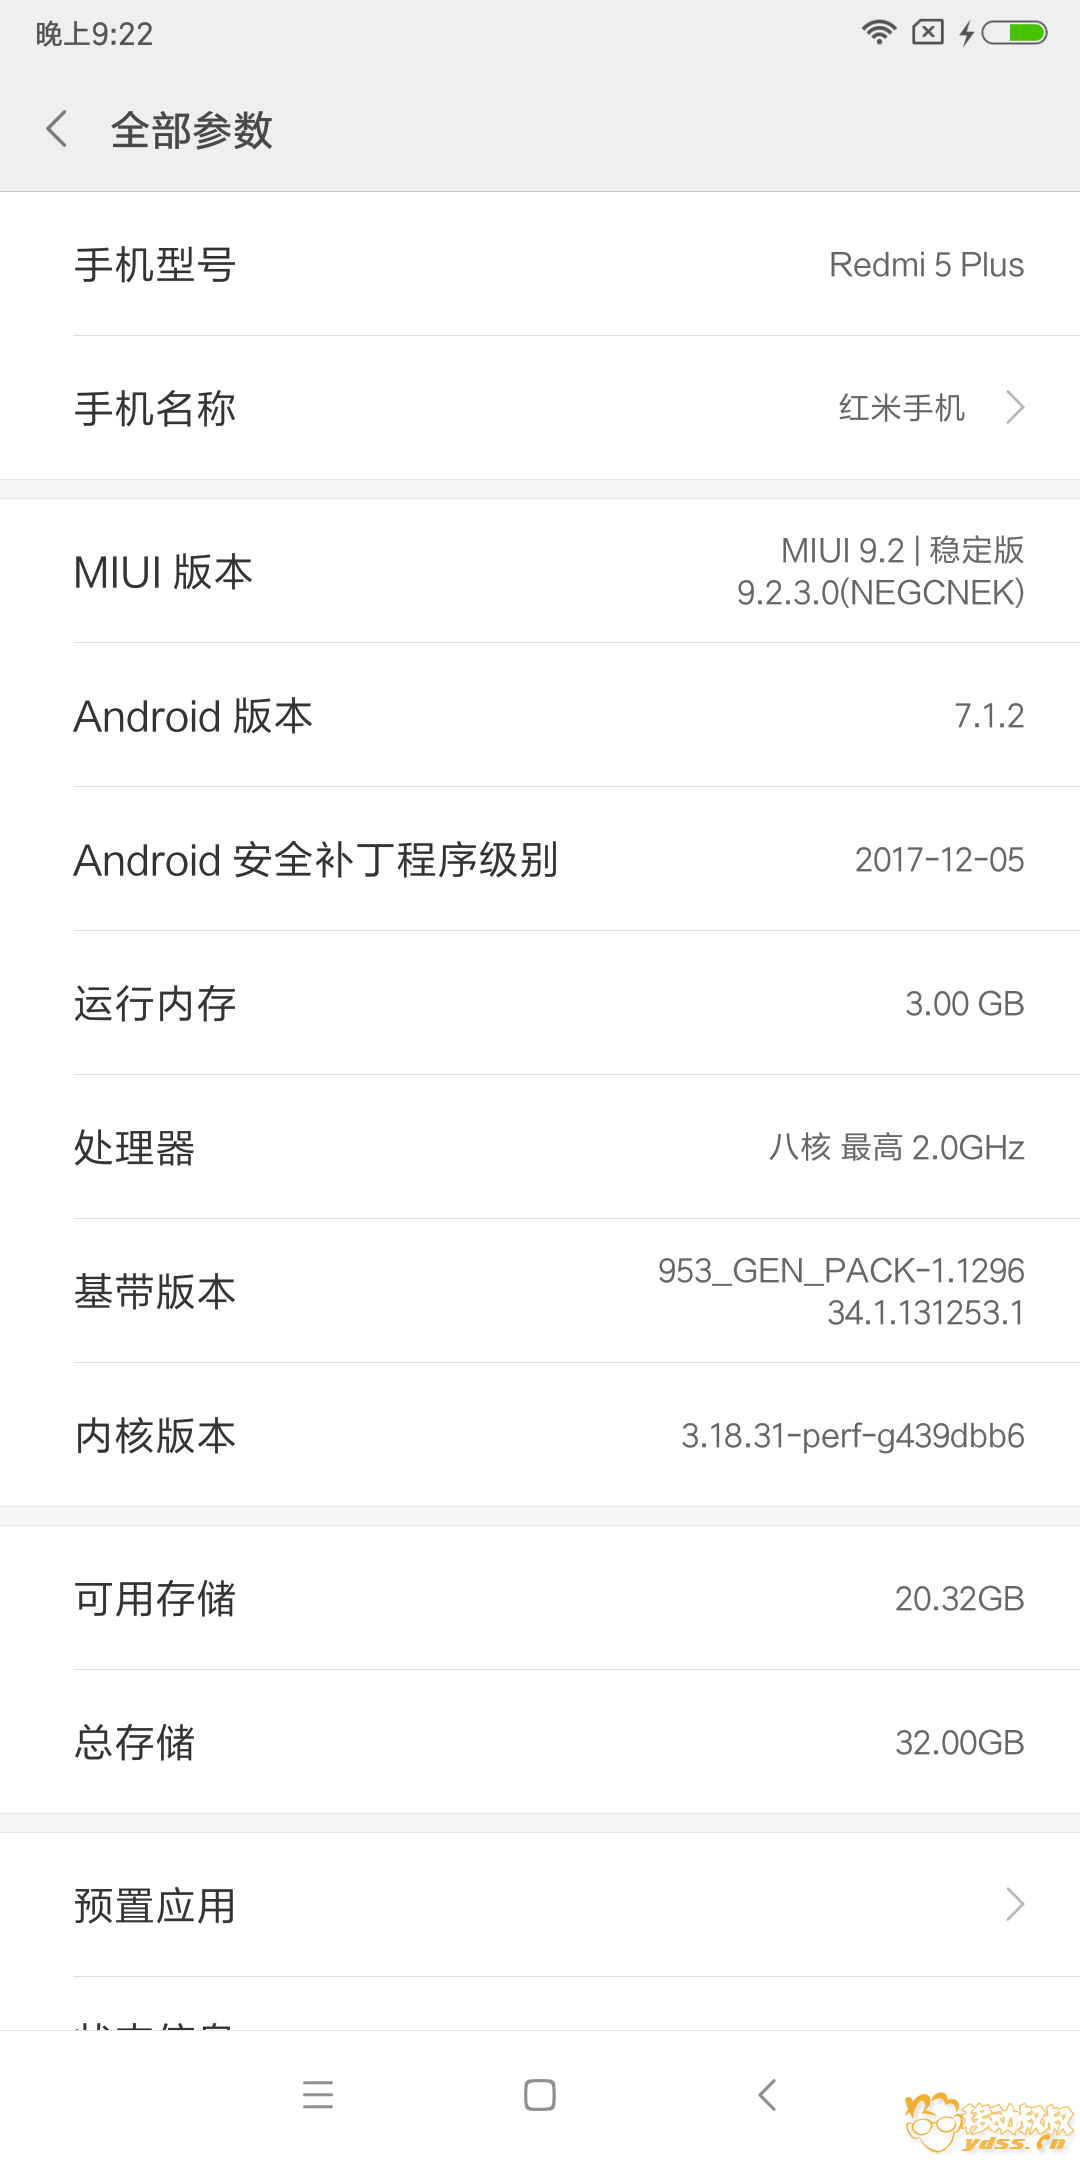 Screenshot_2018-01-31-21-22-44-828_com.android.settings.png